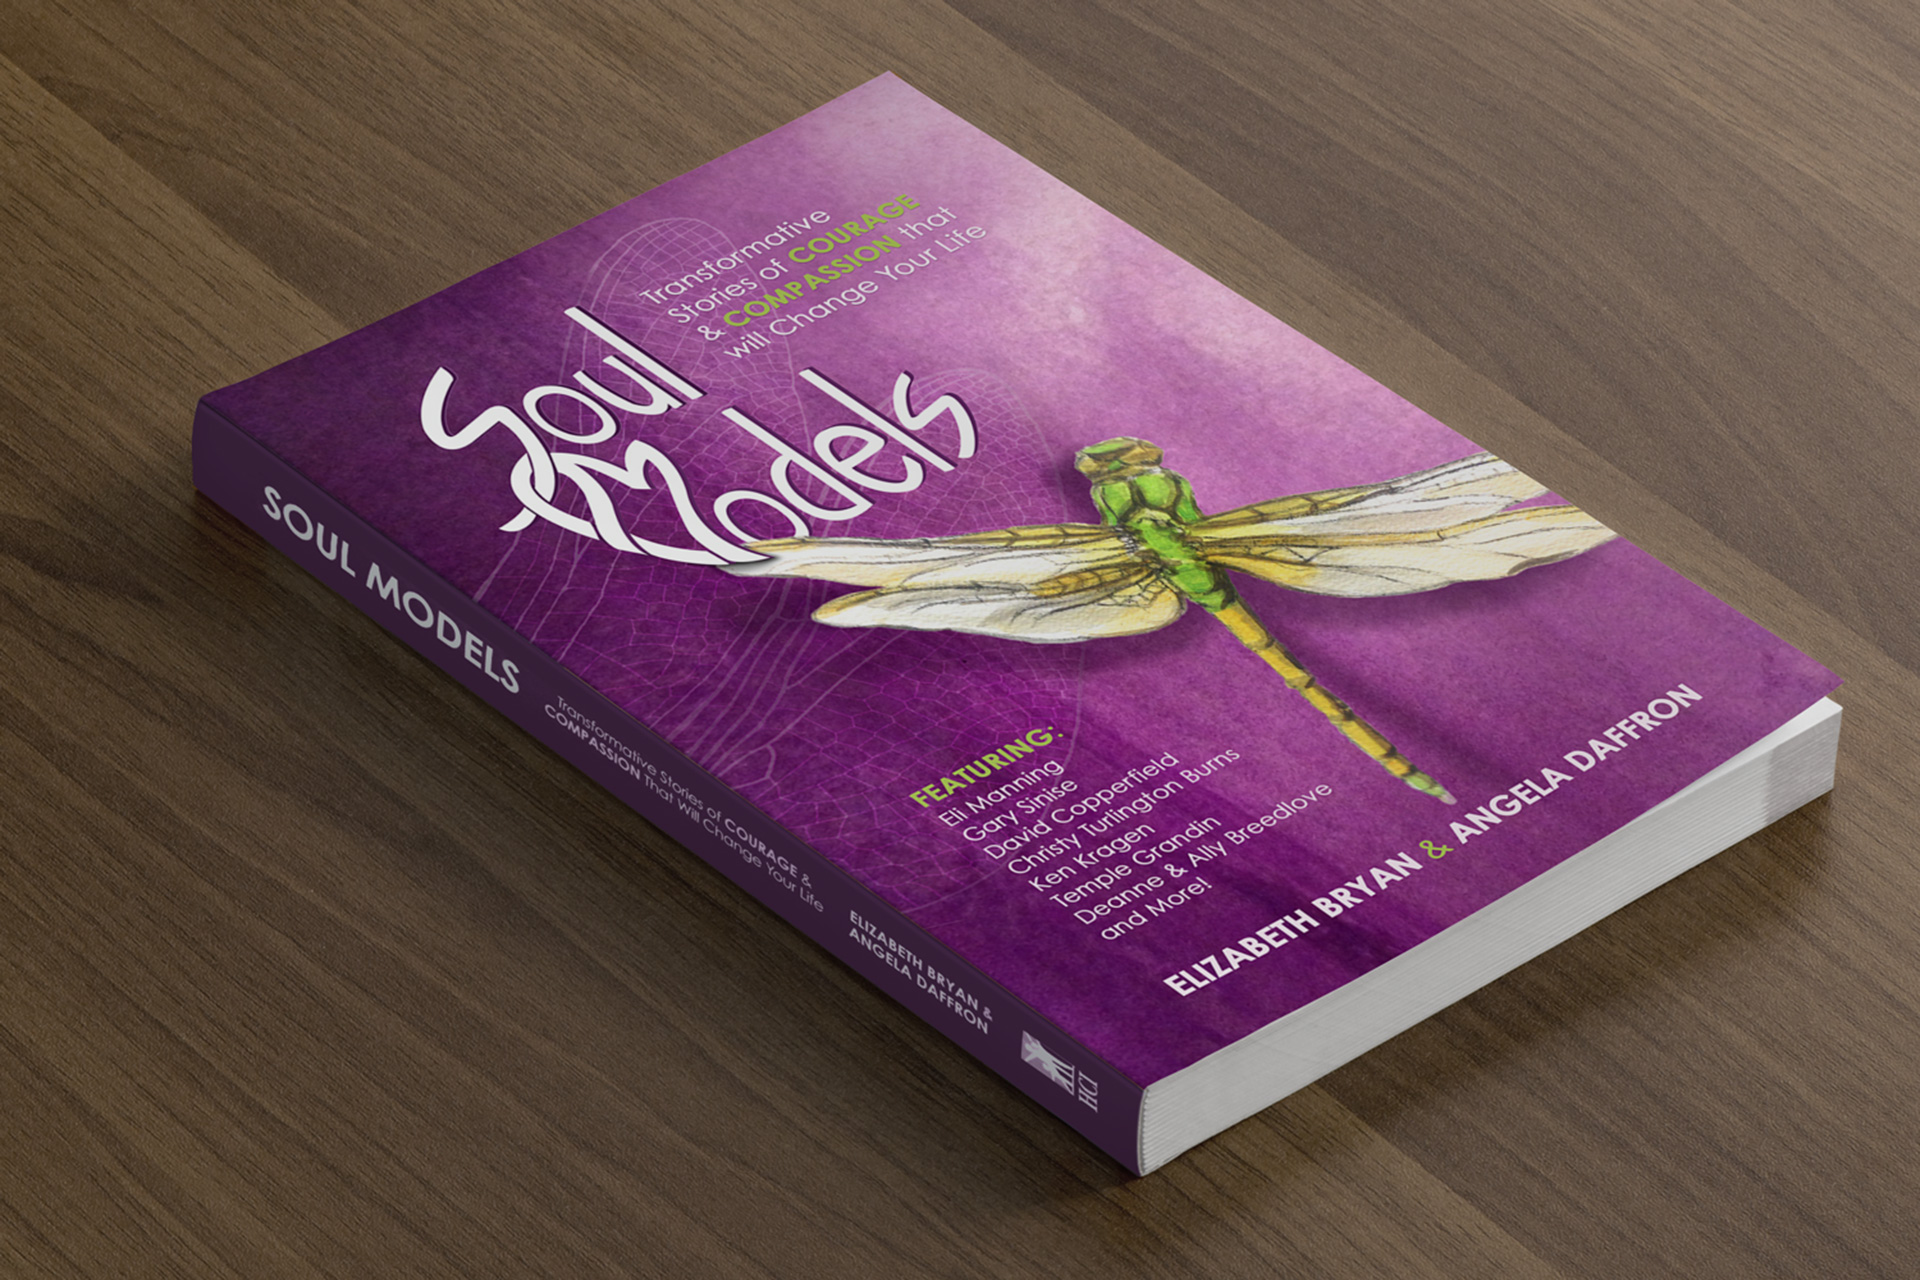 Soul Models book by Elizabeth Bryan-Jacobs